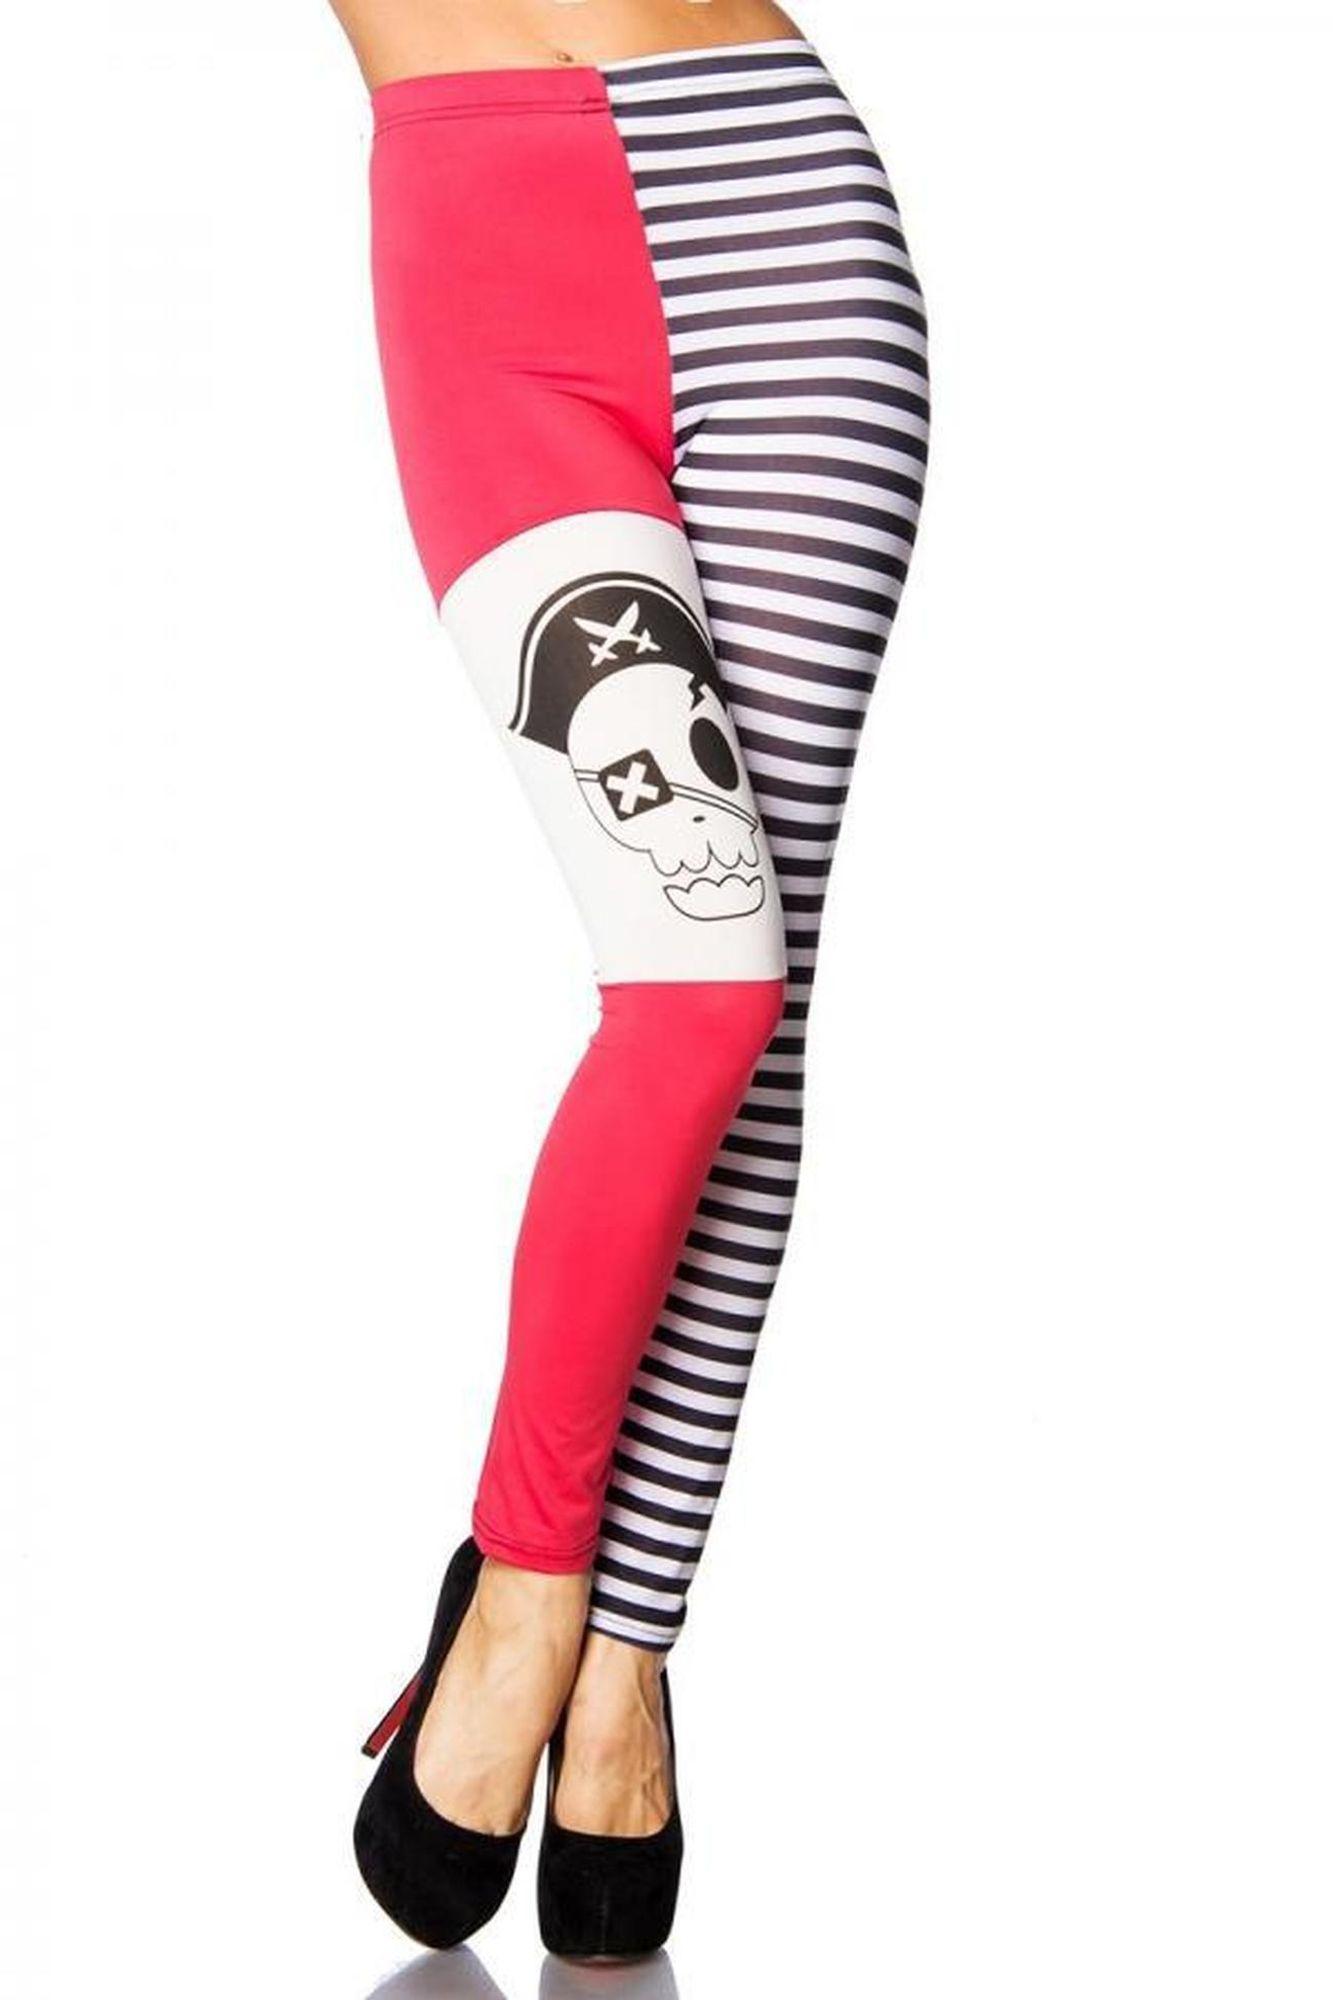 Atixo Piraten-Leggings - schwarz/pink/weiß